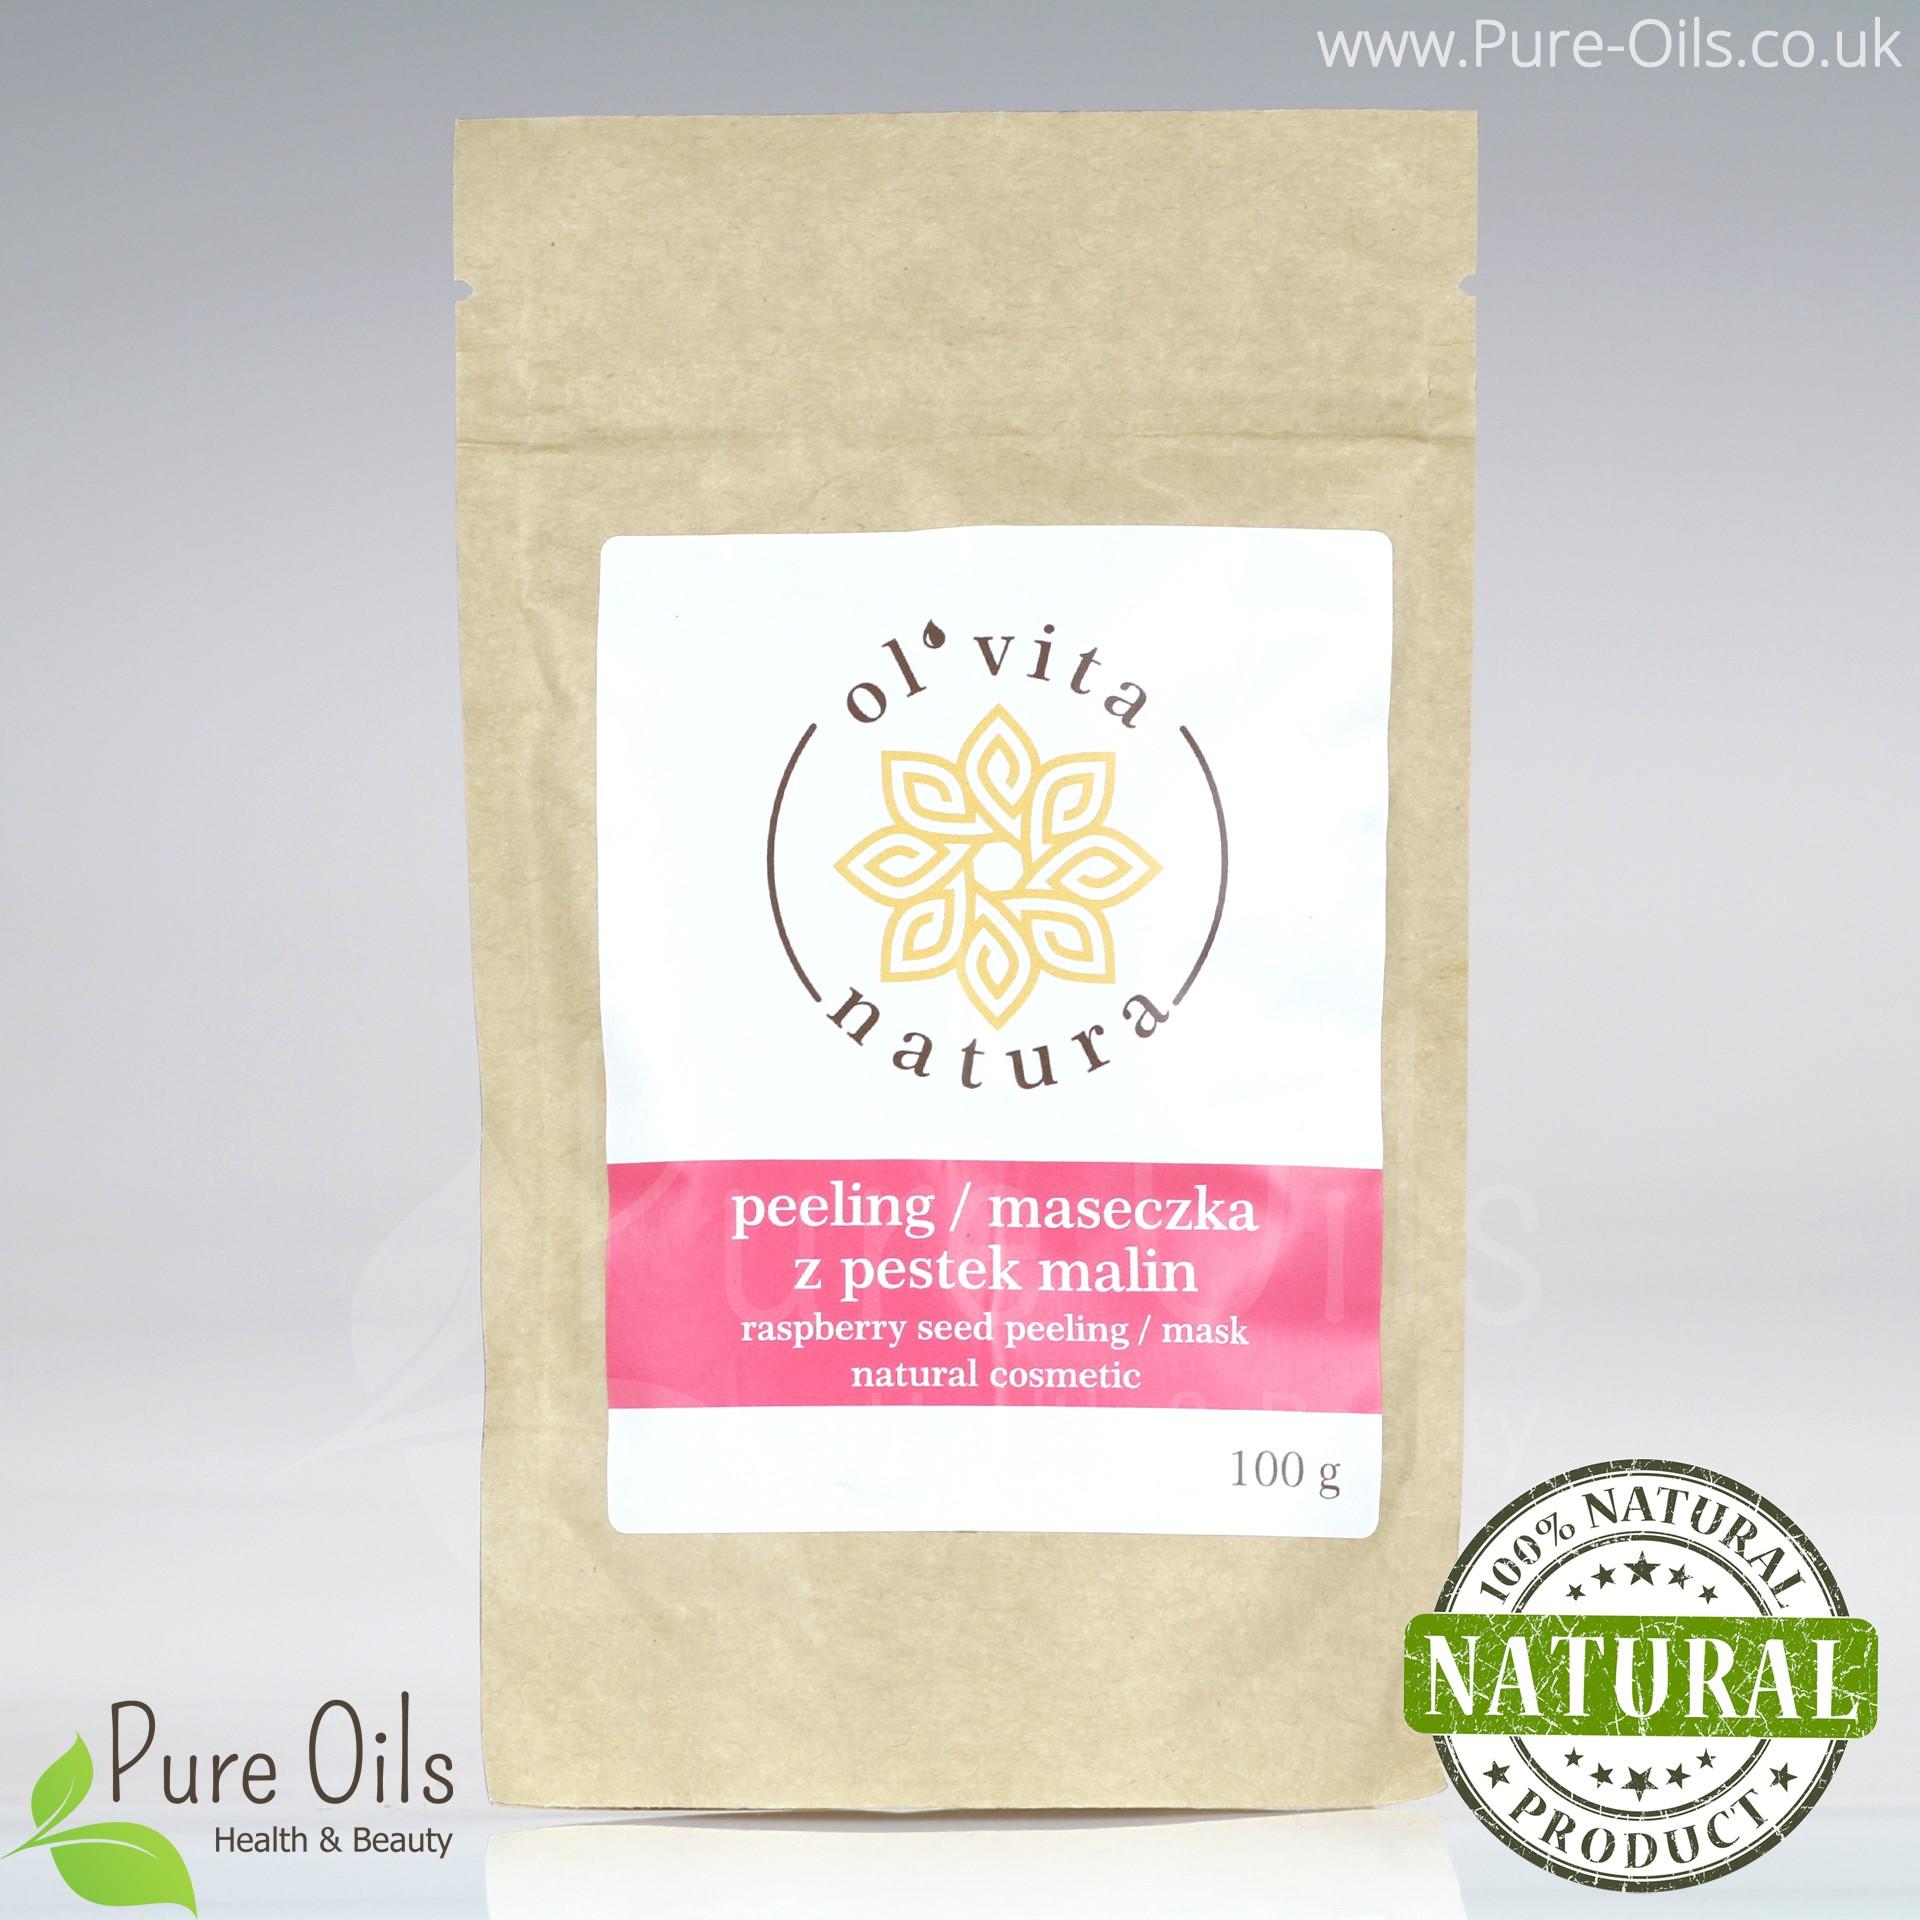 Raspberry Seeds Peeling / Mask, Powder Ol'Vita 100g